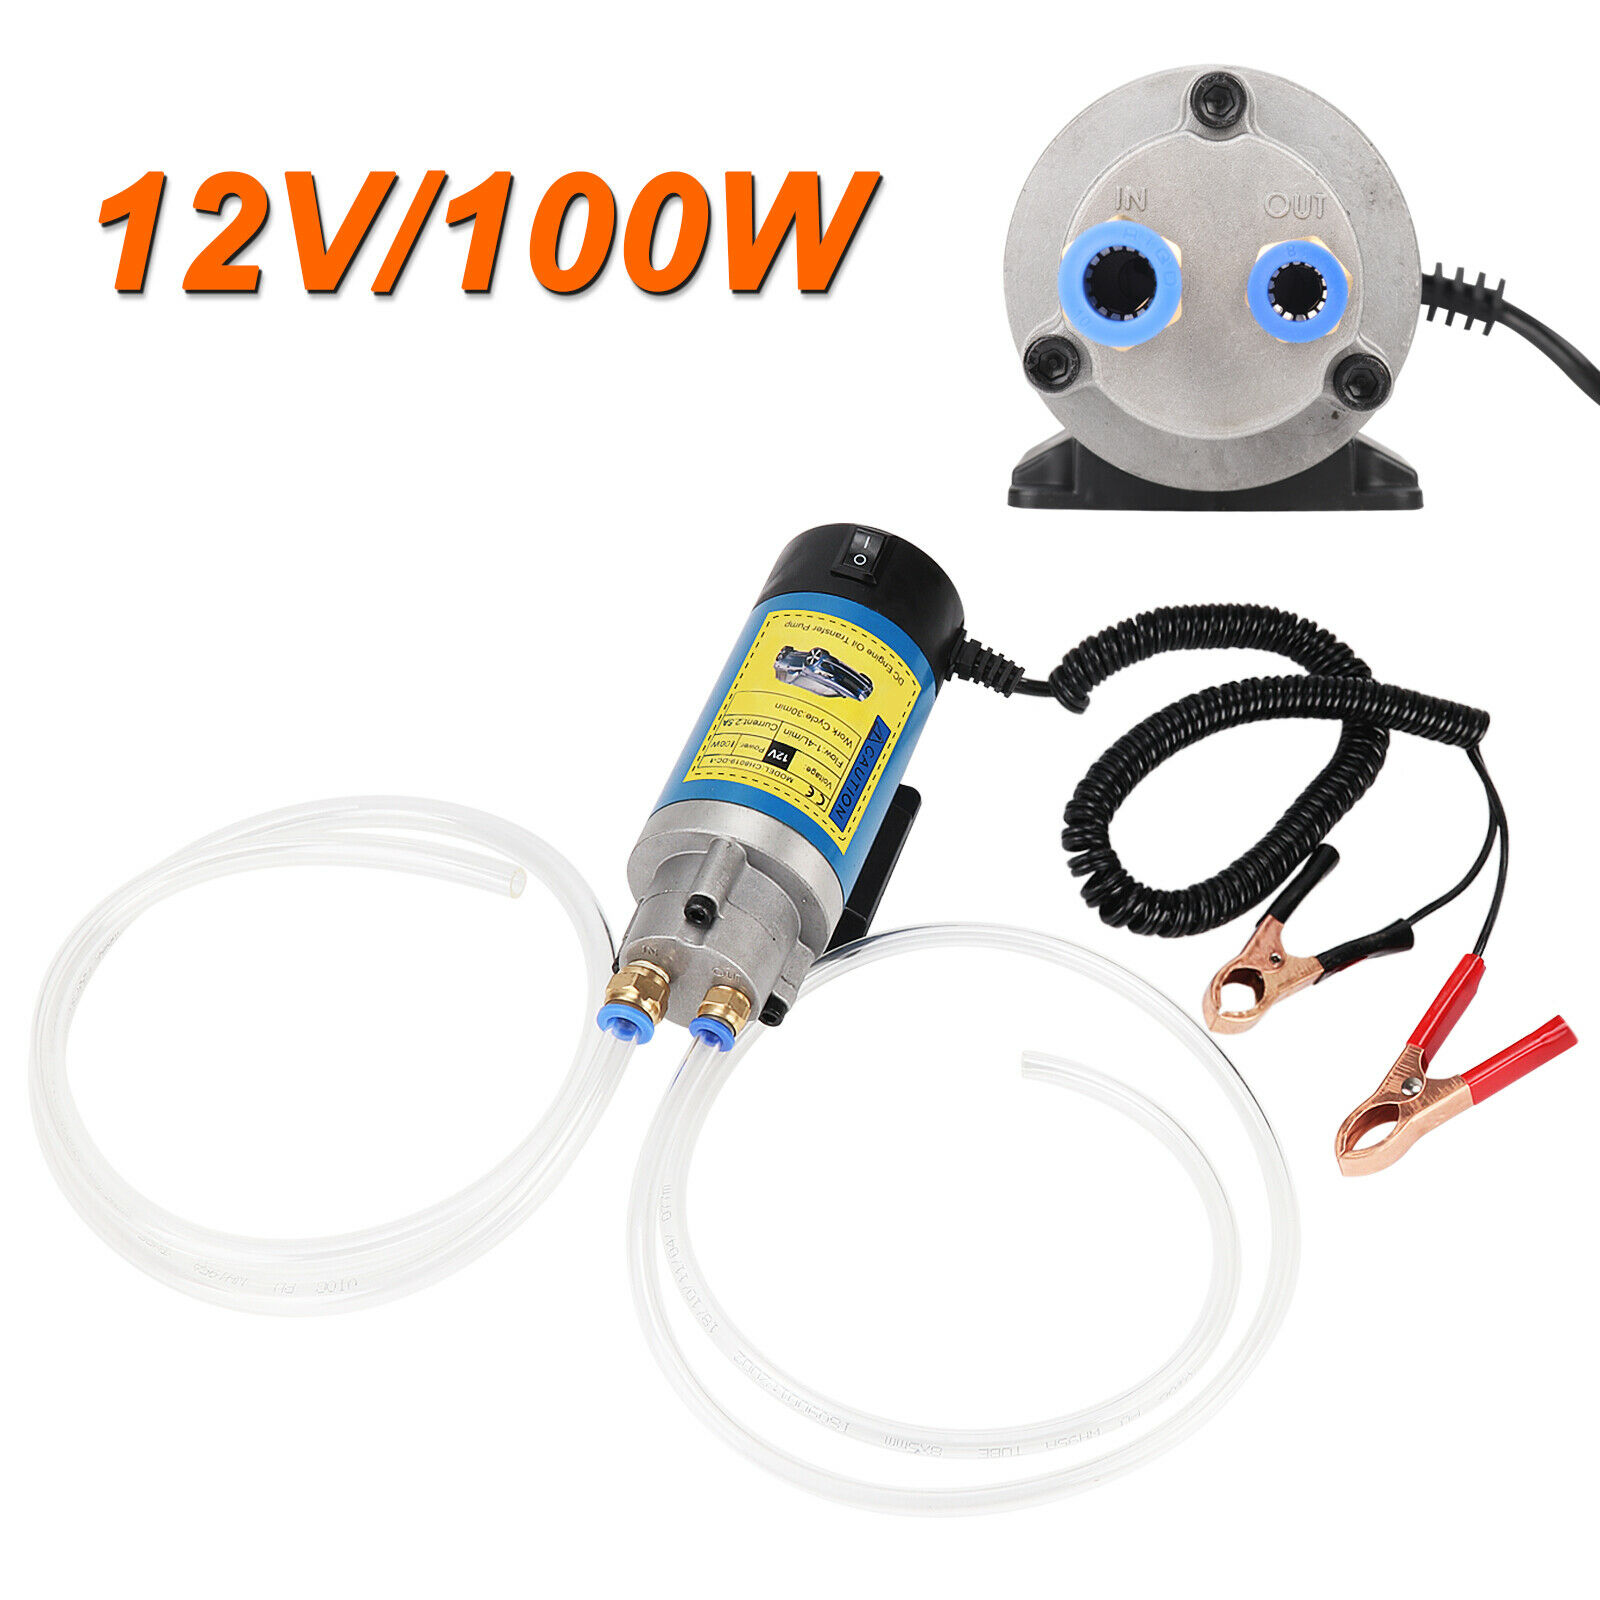 100 W 12 V Diesel Extractor Fluido de Transferência de Óleo Elétrica Sifão Bomba de Carro Moto